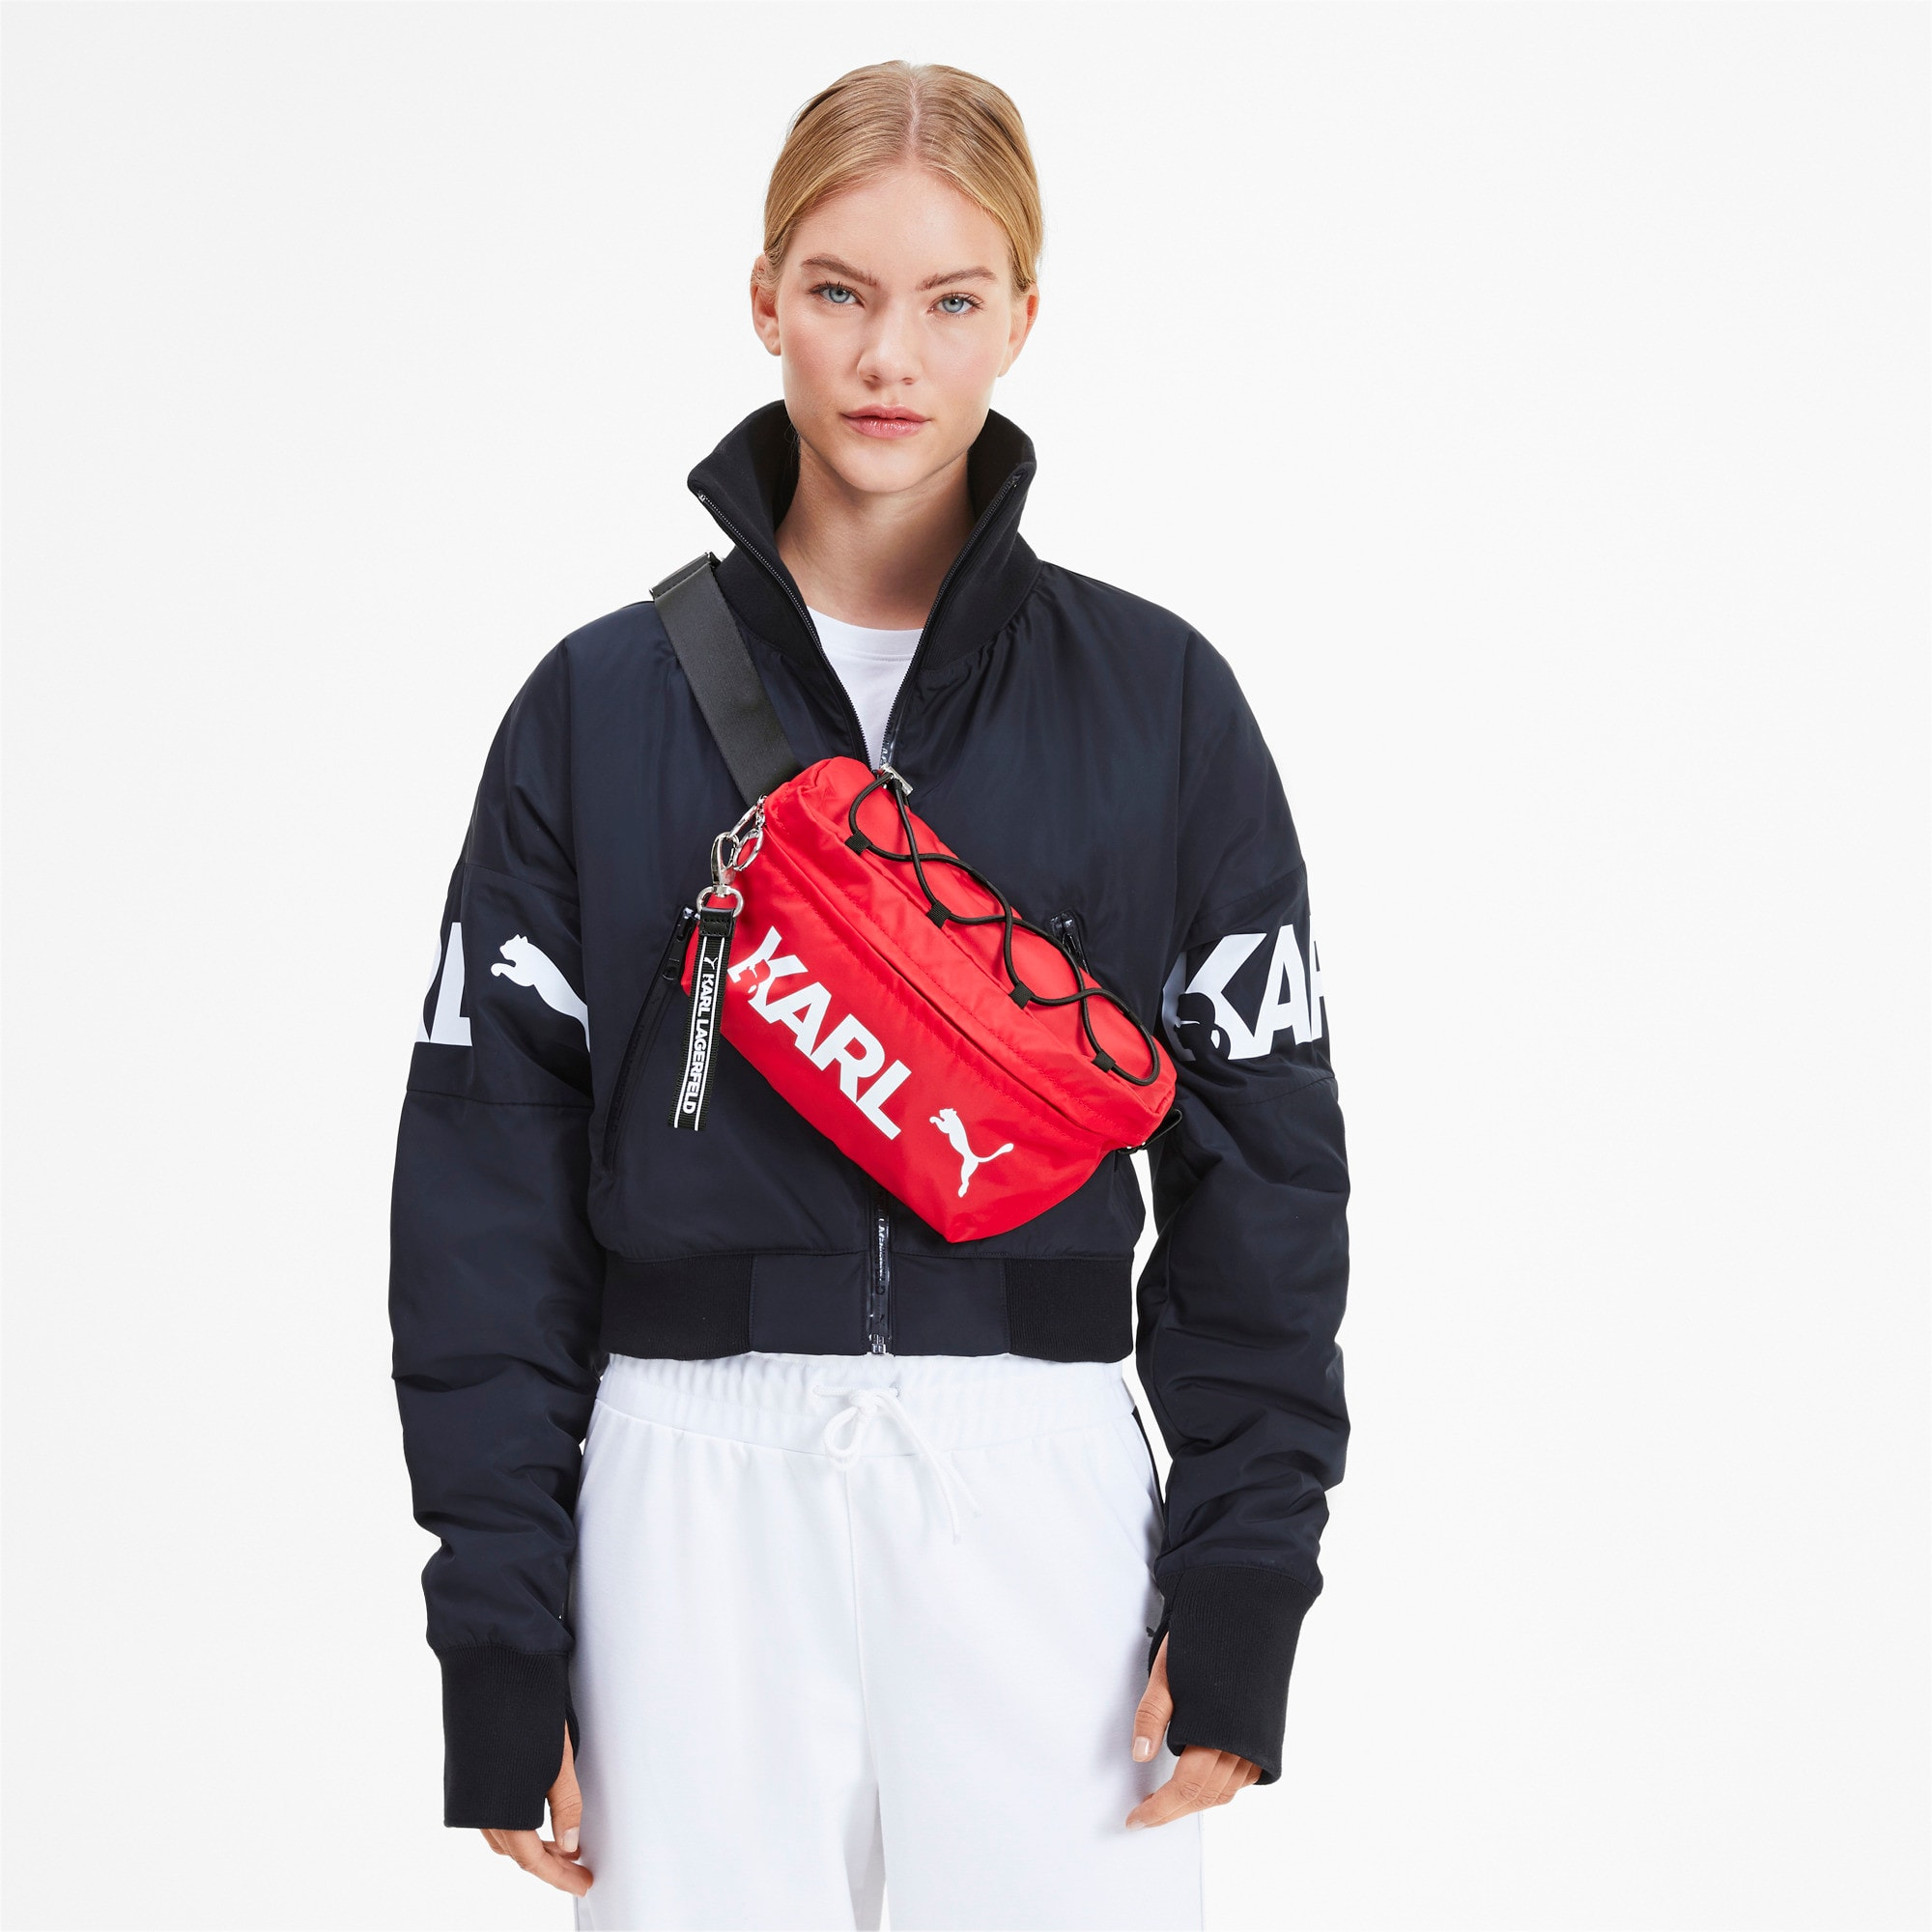 Thumbnail 3 of PUMA x KARL LAGERFELD Waist Bag, High Risk Red-Puma Black, medium